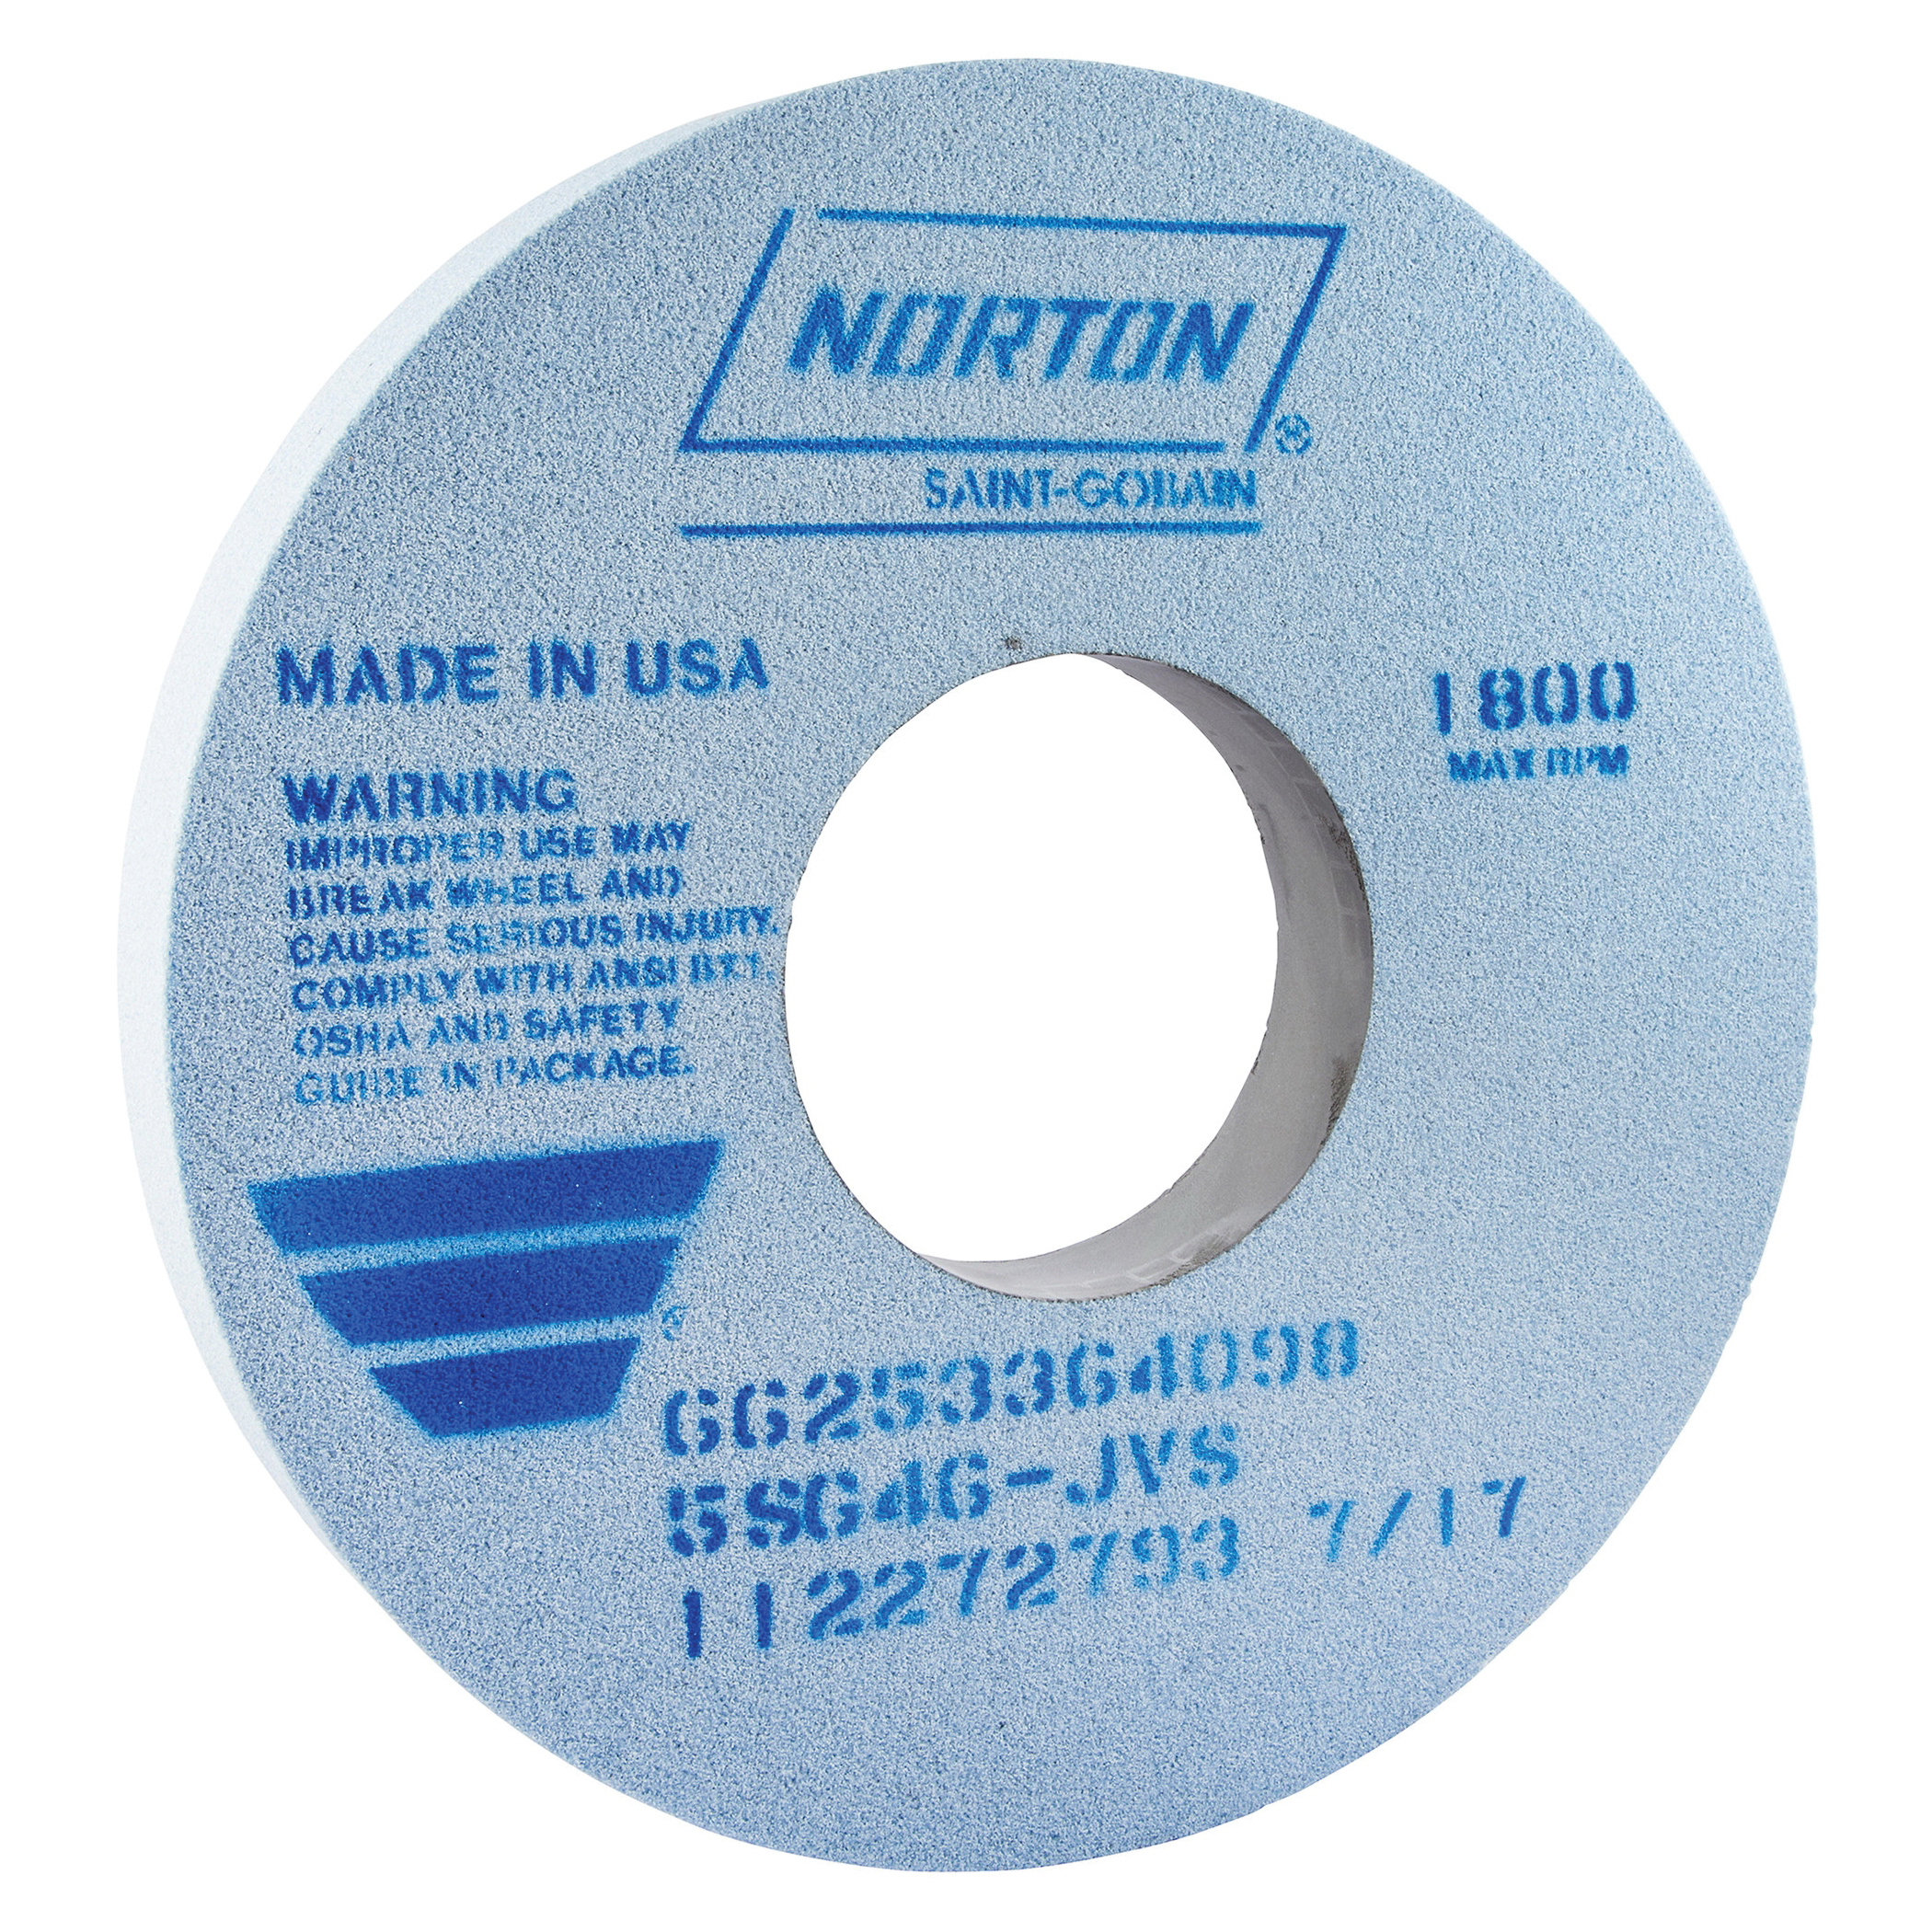 Norton® 66253302160 5SG Straight Toolroom Wheel, 14 in Dia x 1-1/2 in THK, 5 in Center Hole, 60 Grit, Ceramic Alumina/Friable Aluminum Oxide Abrasive